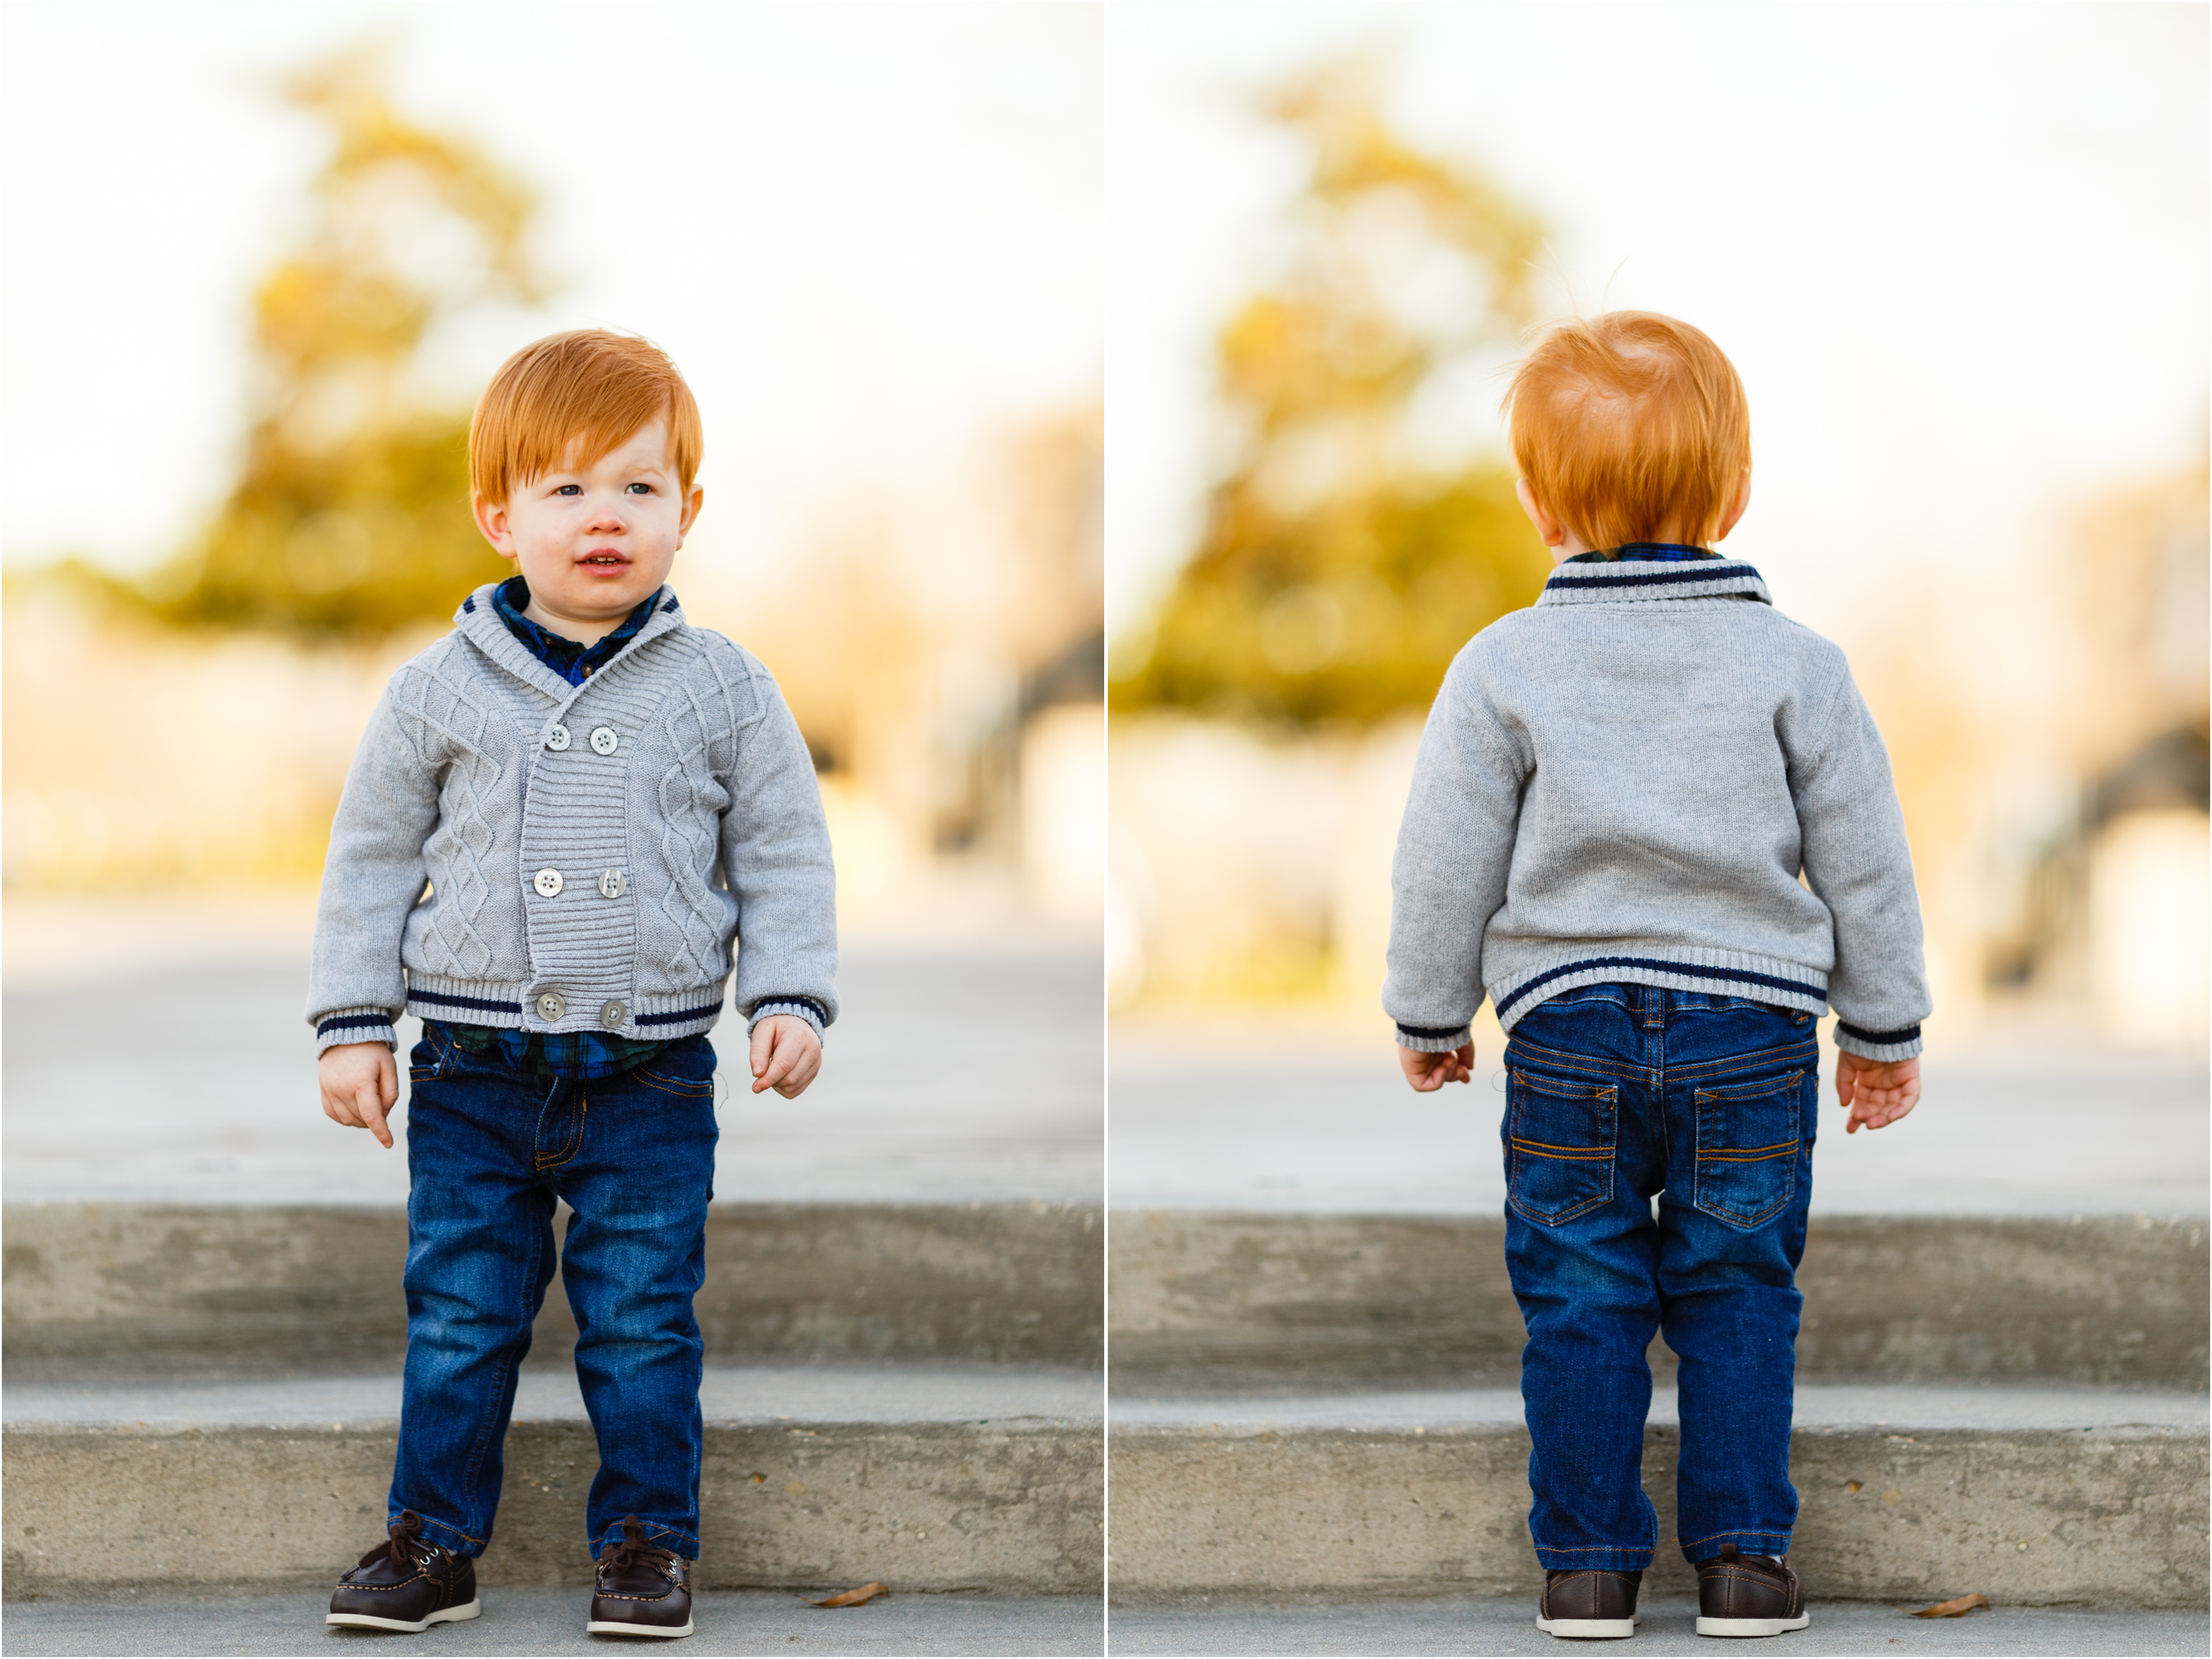 Family-child-portrait-lafayette-broussard-youngsville-photographer (1).jpg